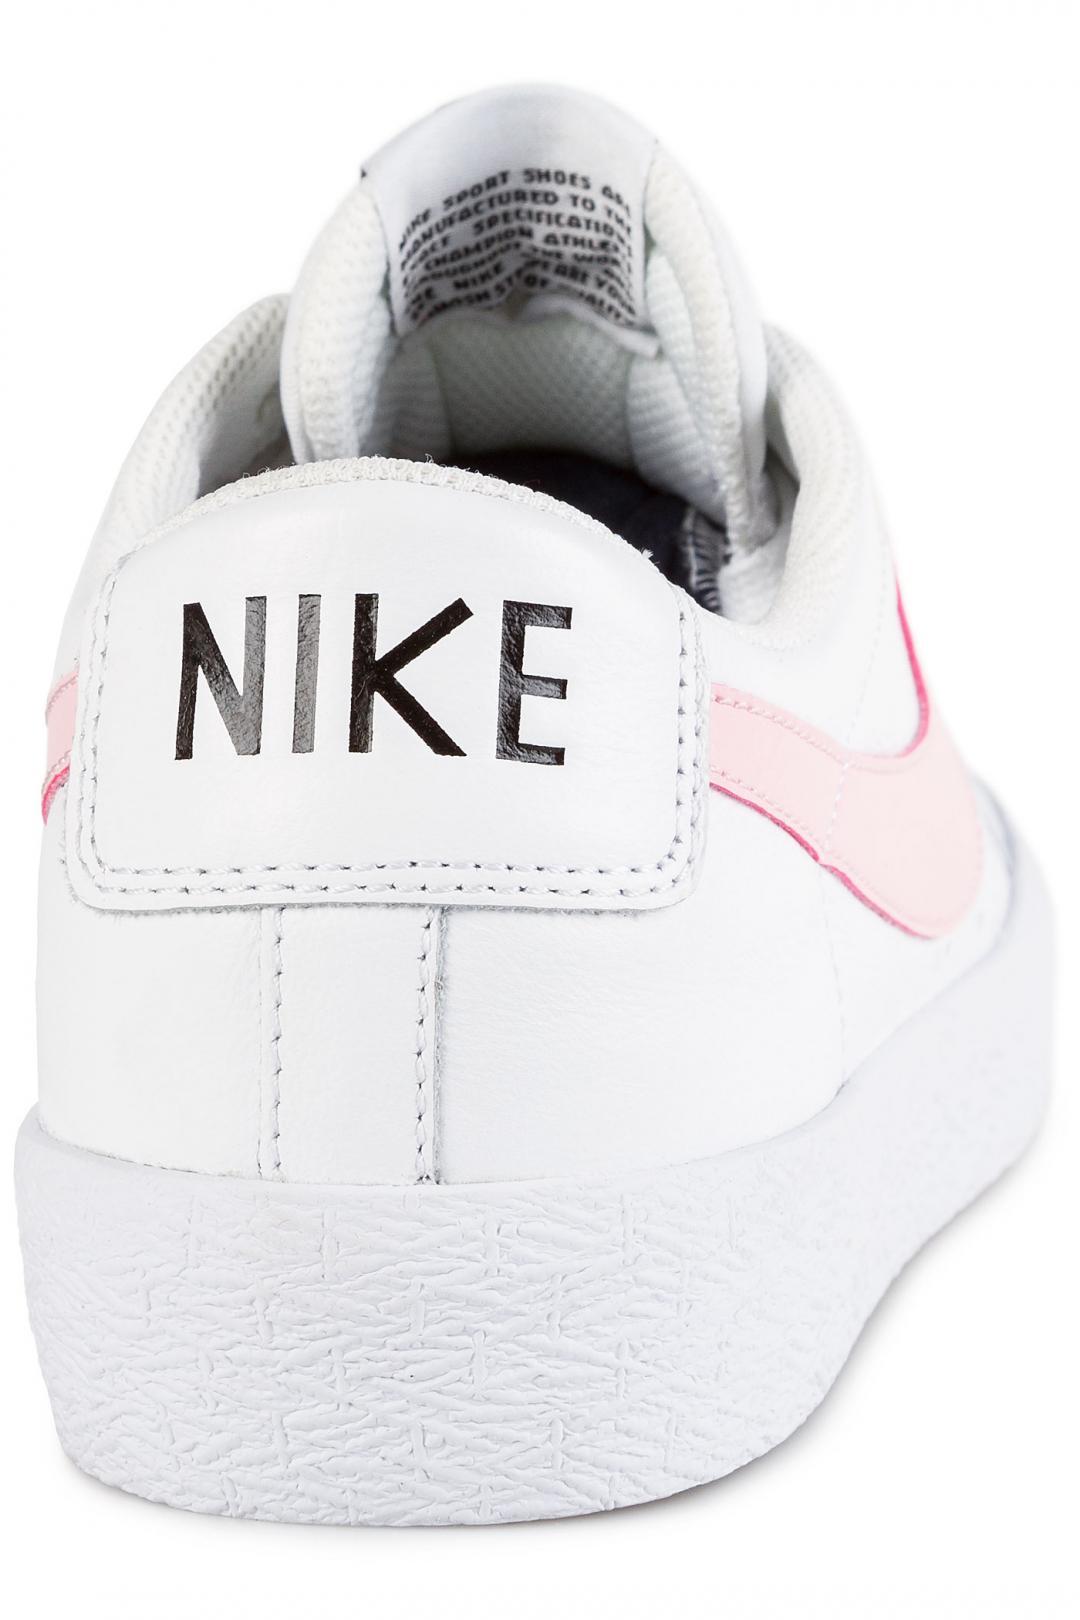 Uomo Nike SB Zoom Blazer Low XT white prism pink   Sneakers low top